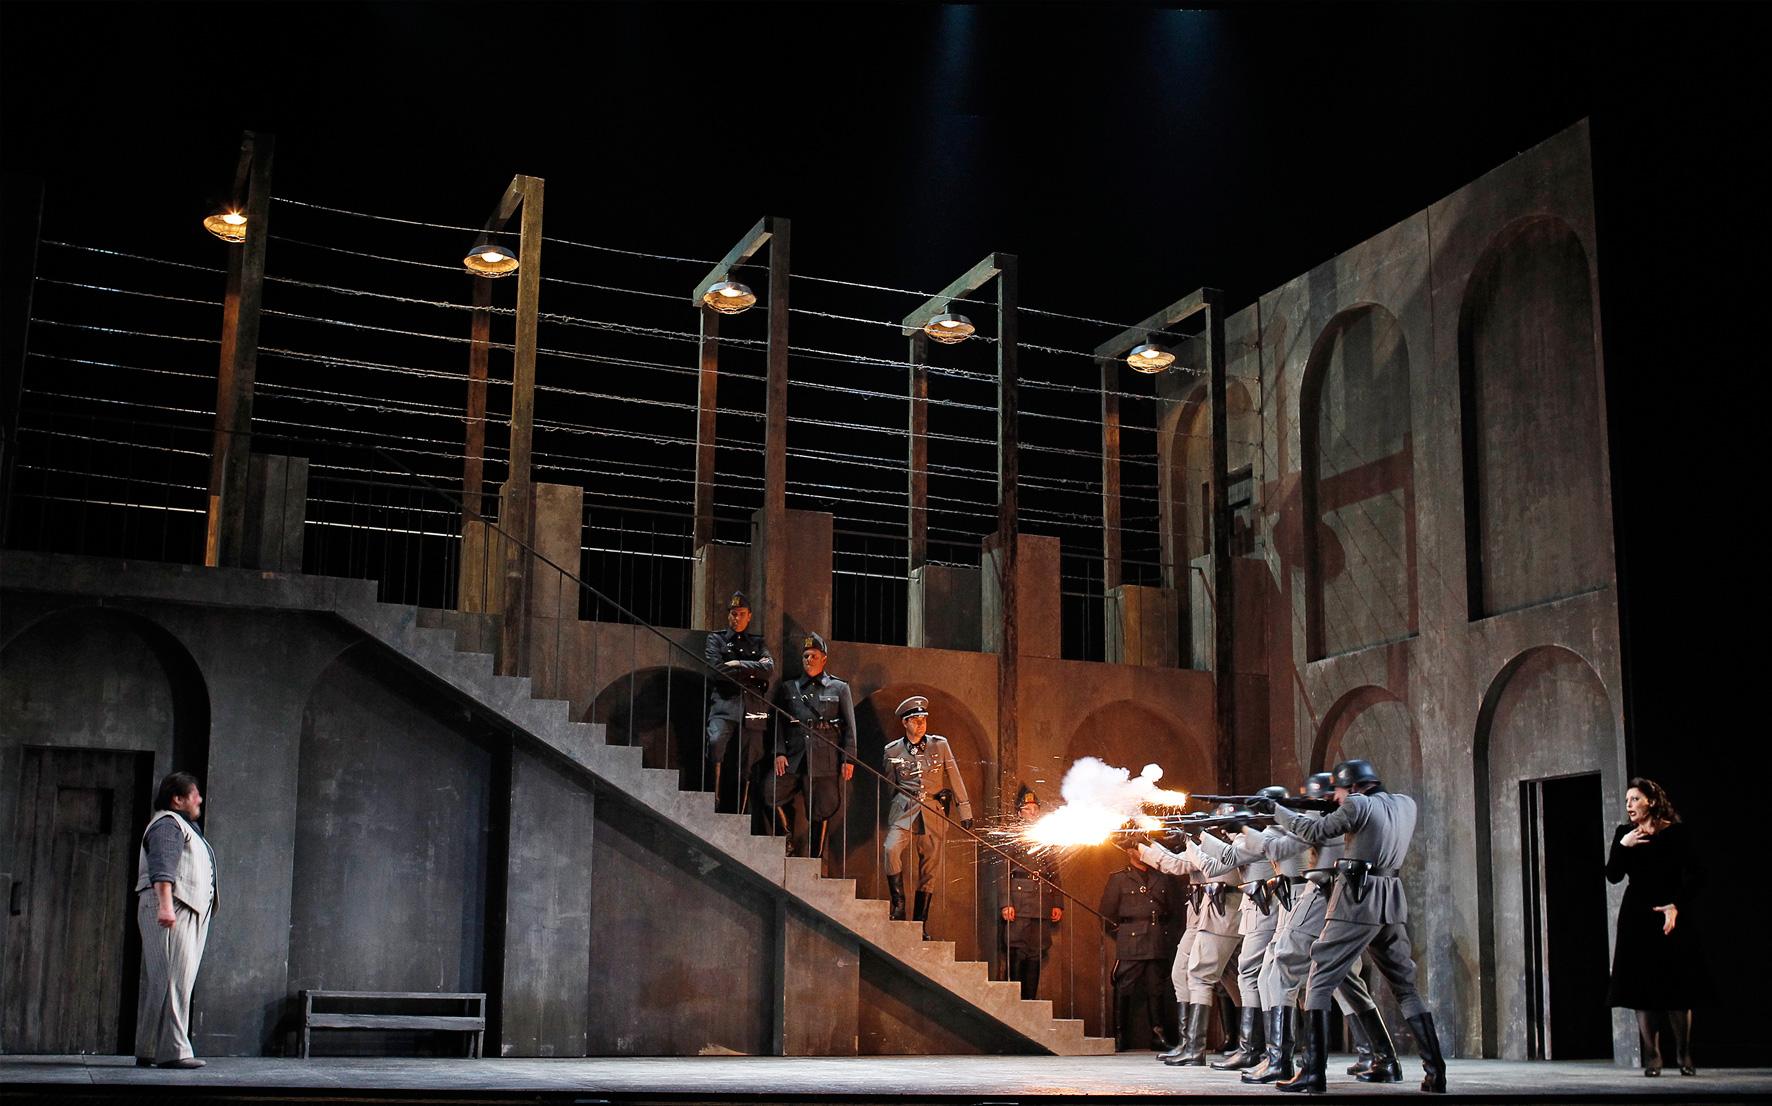 Photo by Jeff Busby from 2014 Opera Australia.